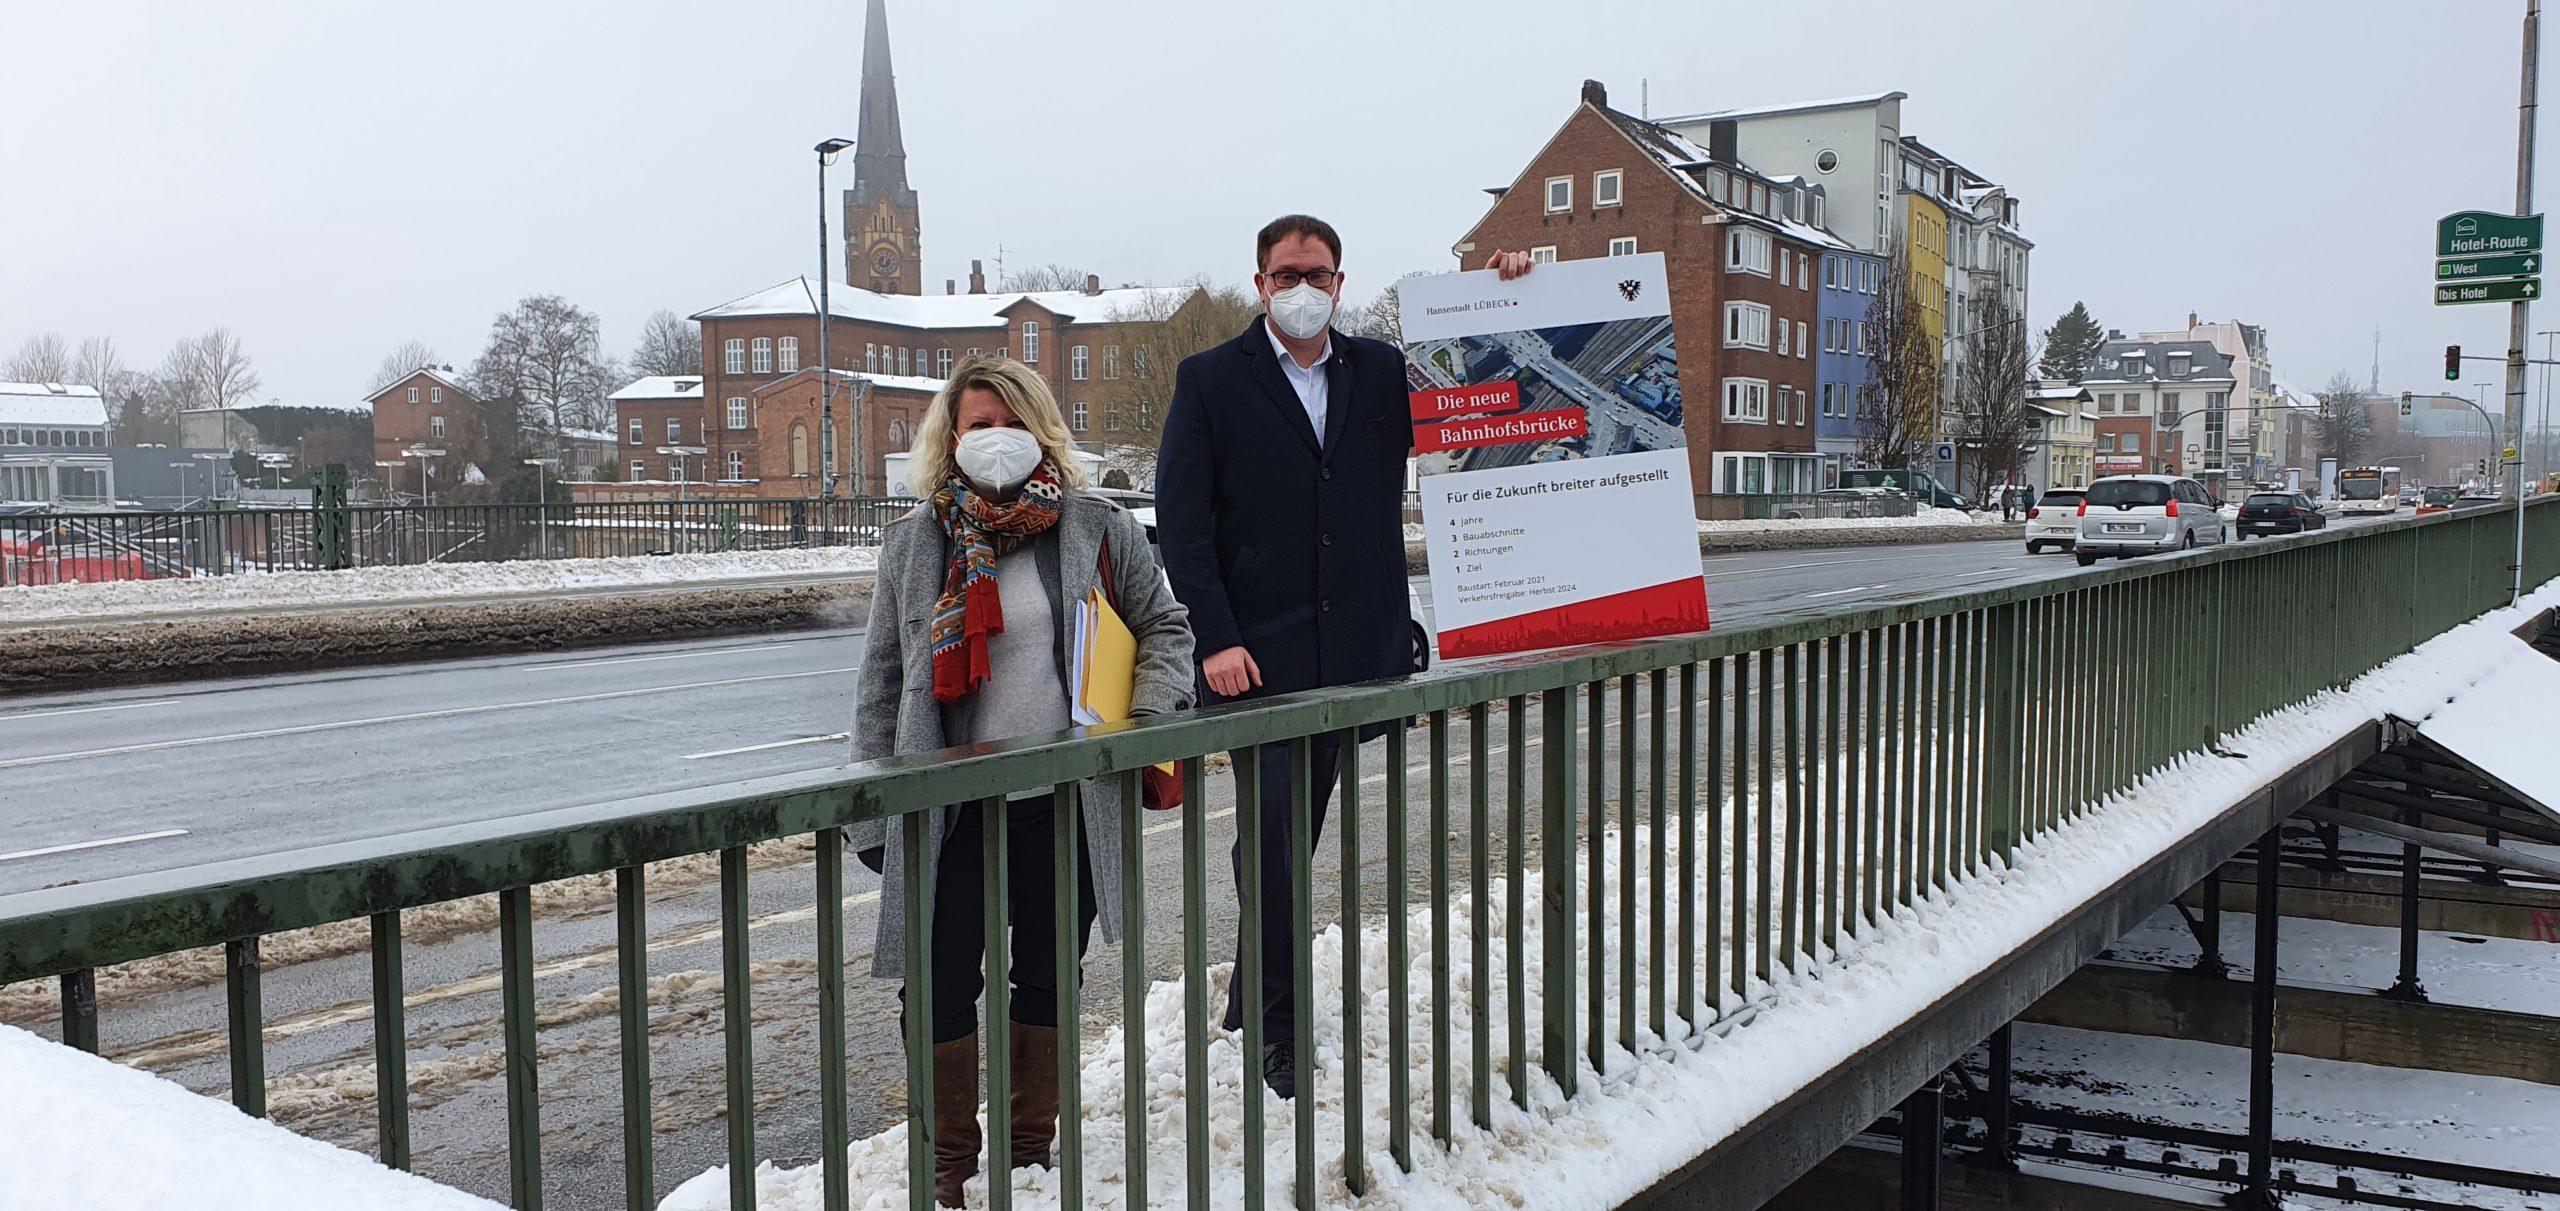 Bahnhofsbrücke Lübeck wird saniert